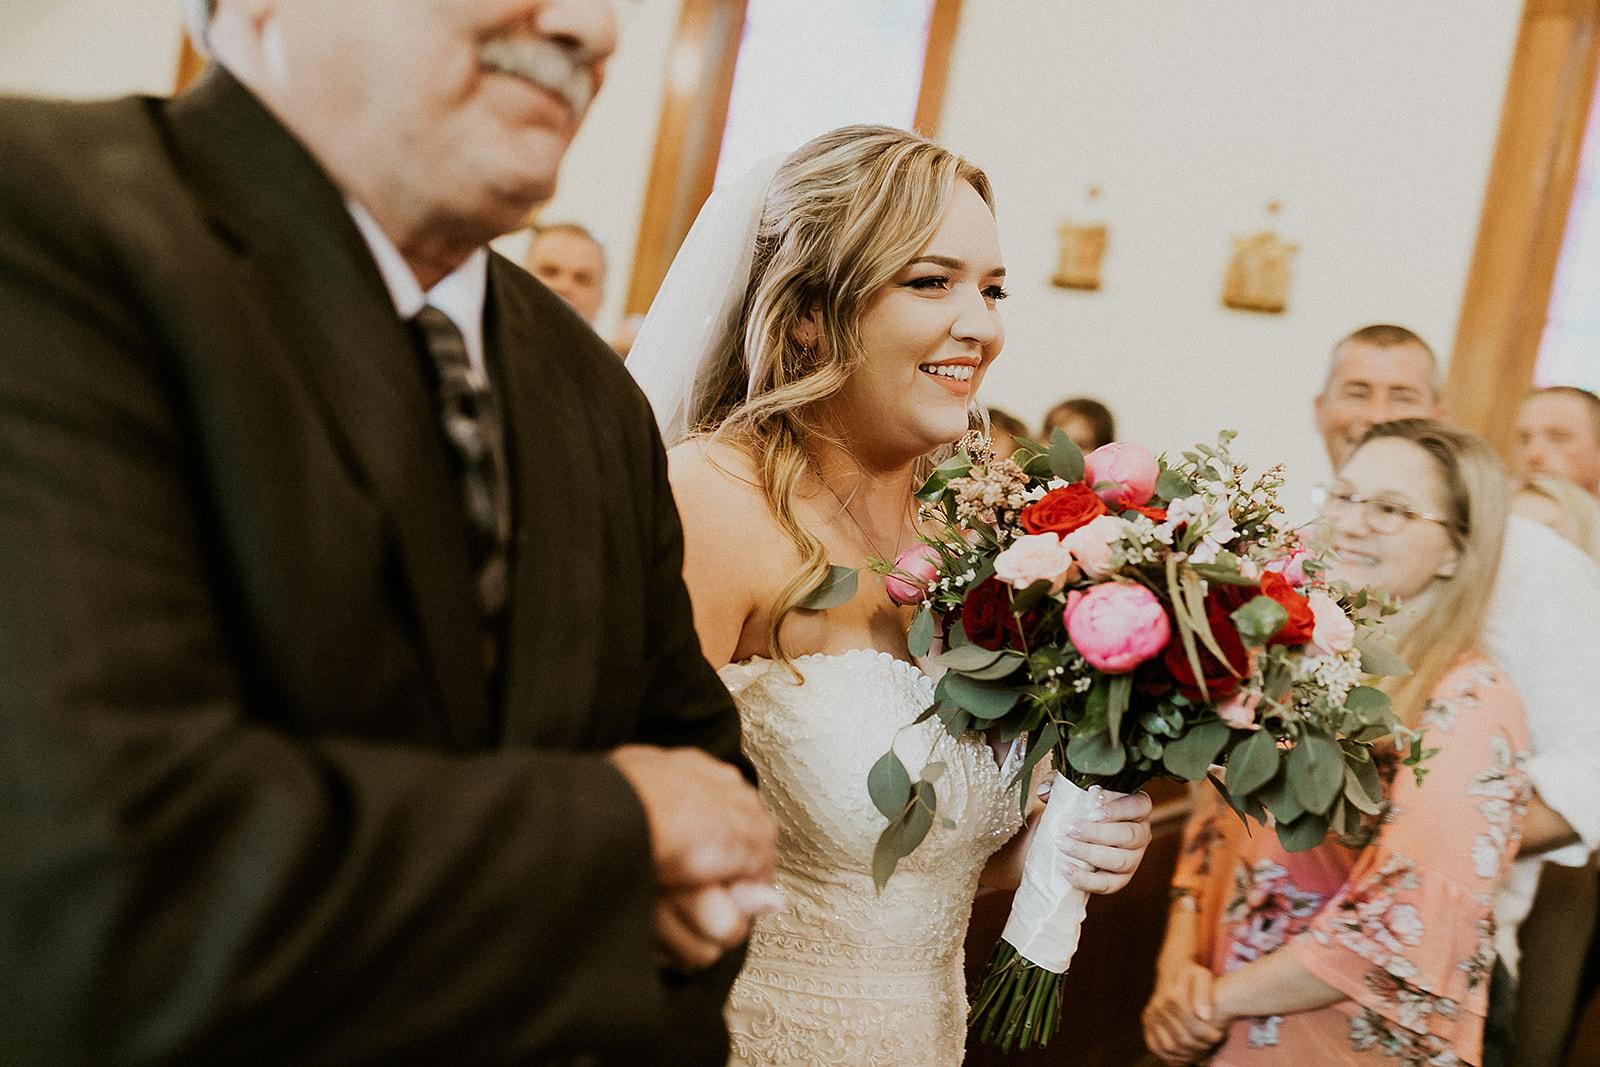 Molly & Tanner's Wedding